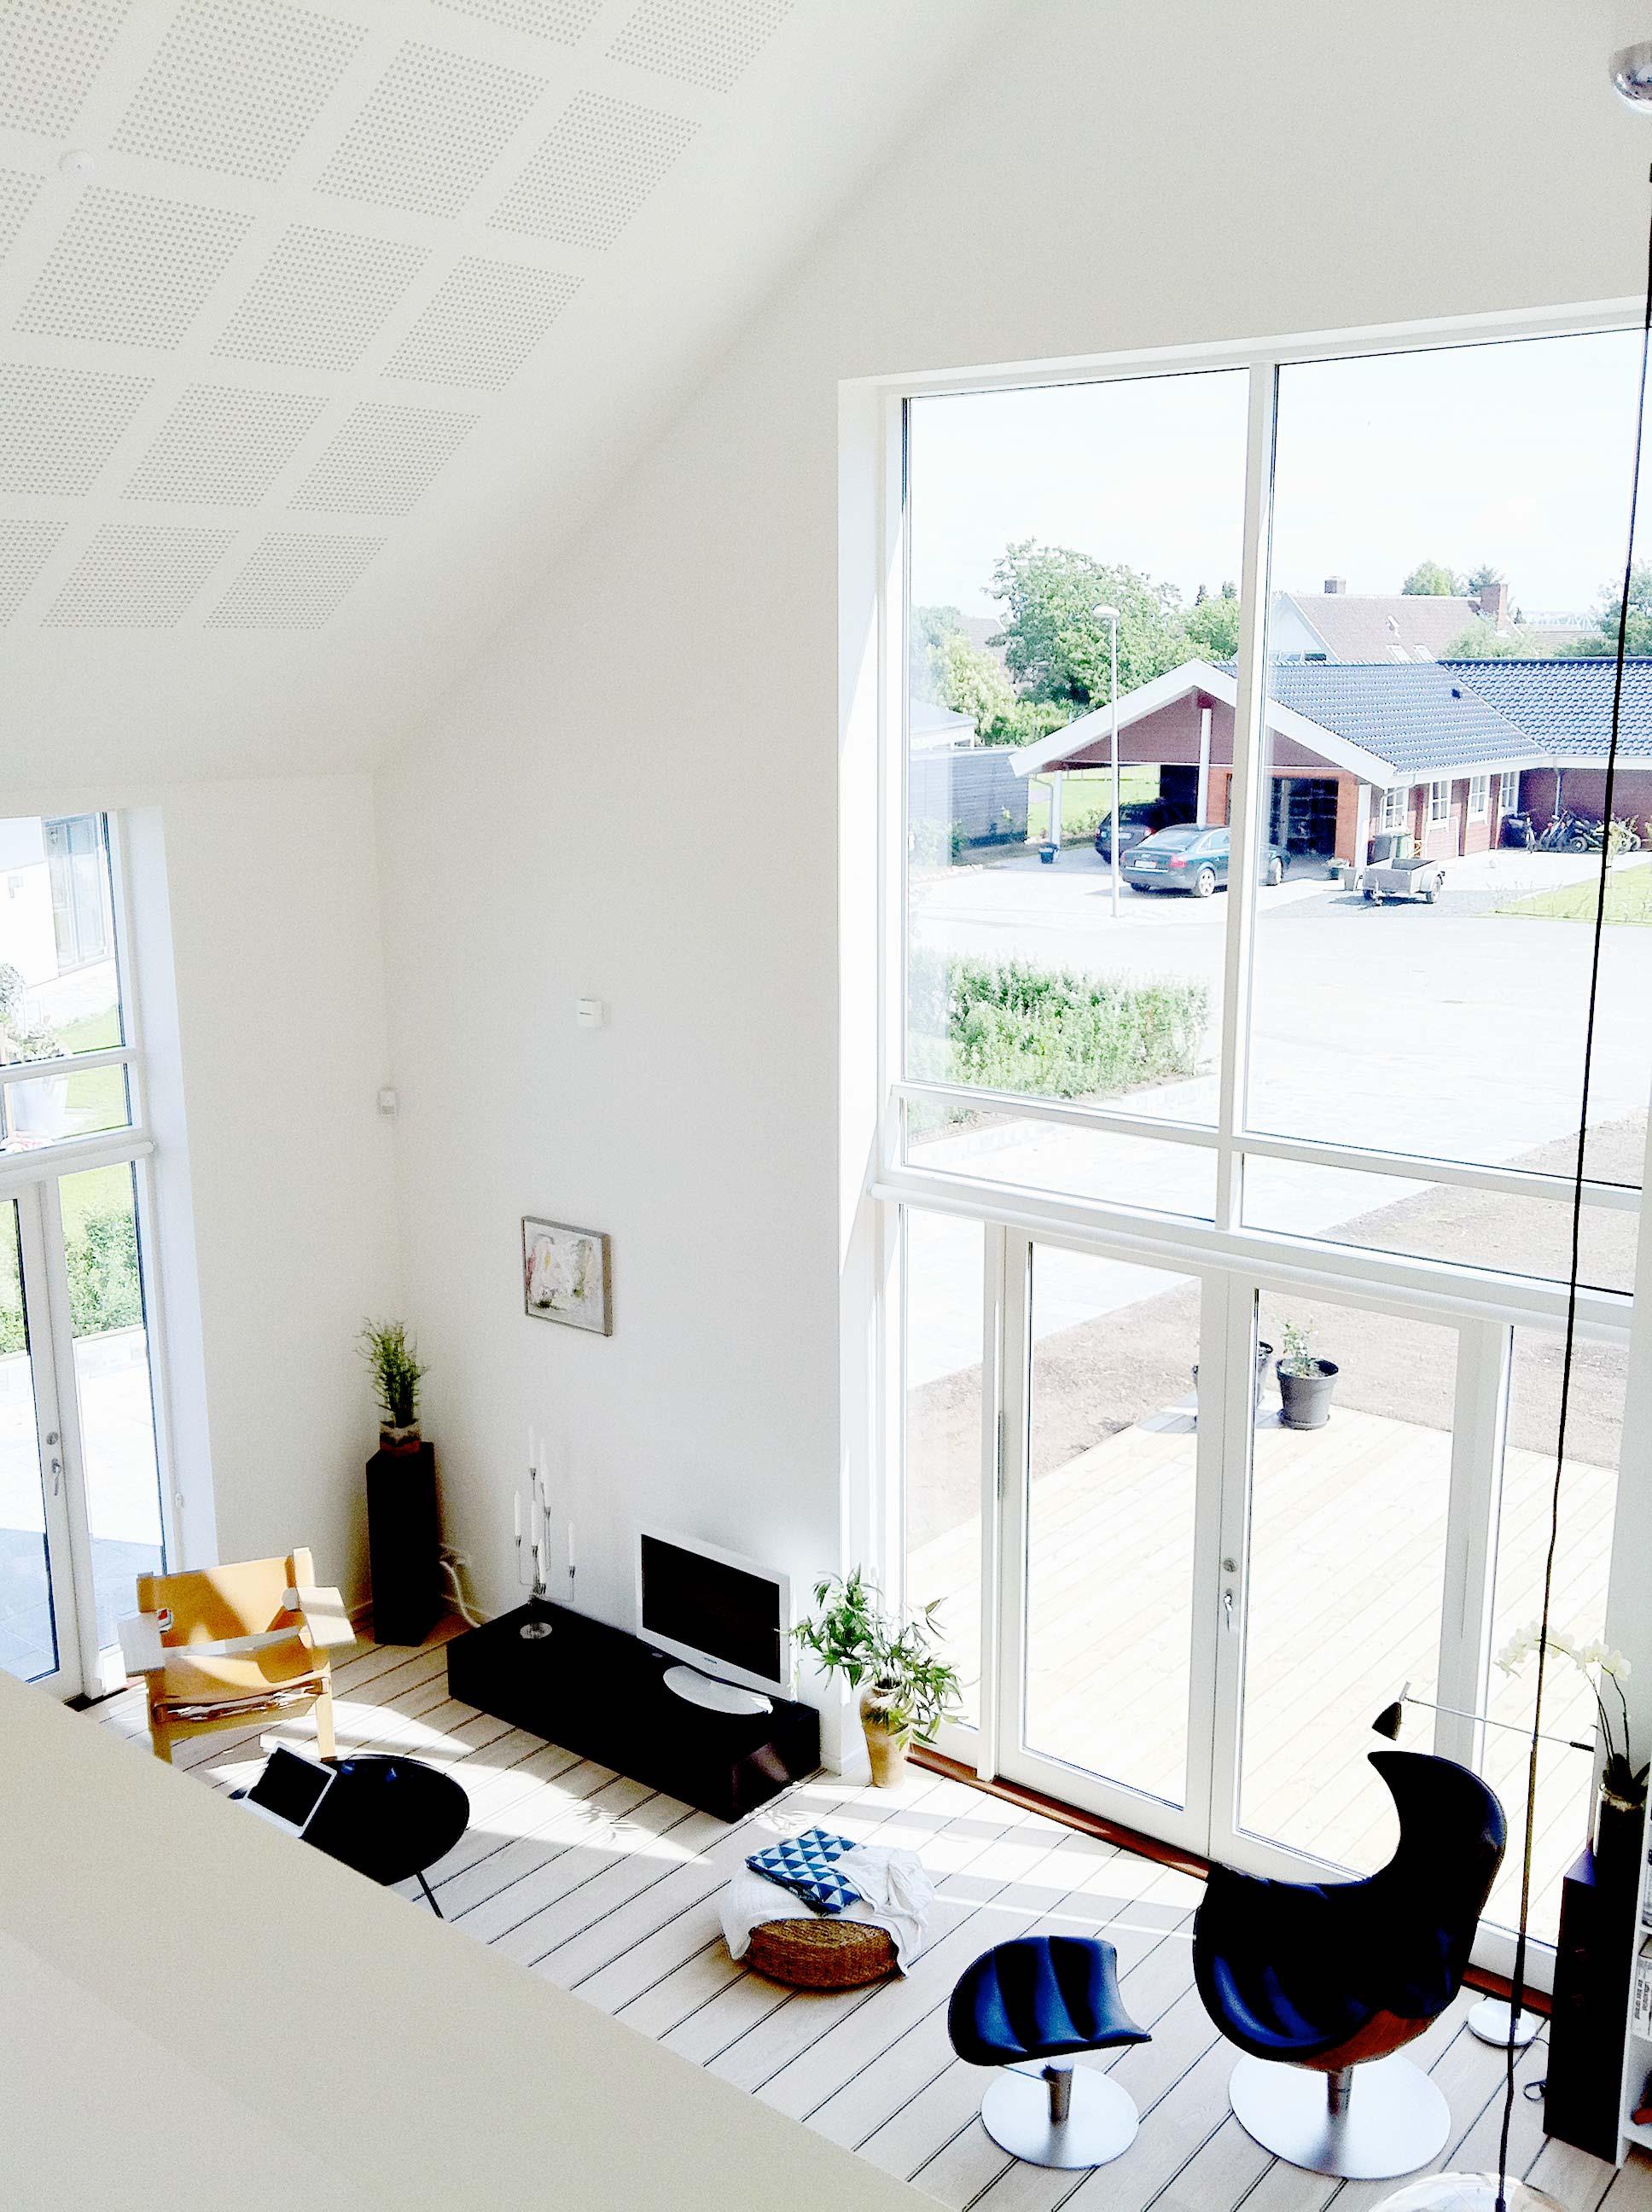 oneroom_arkitekttegnet_in_13.jpg